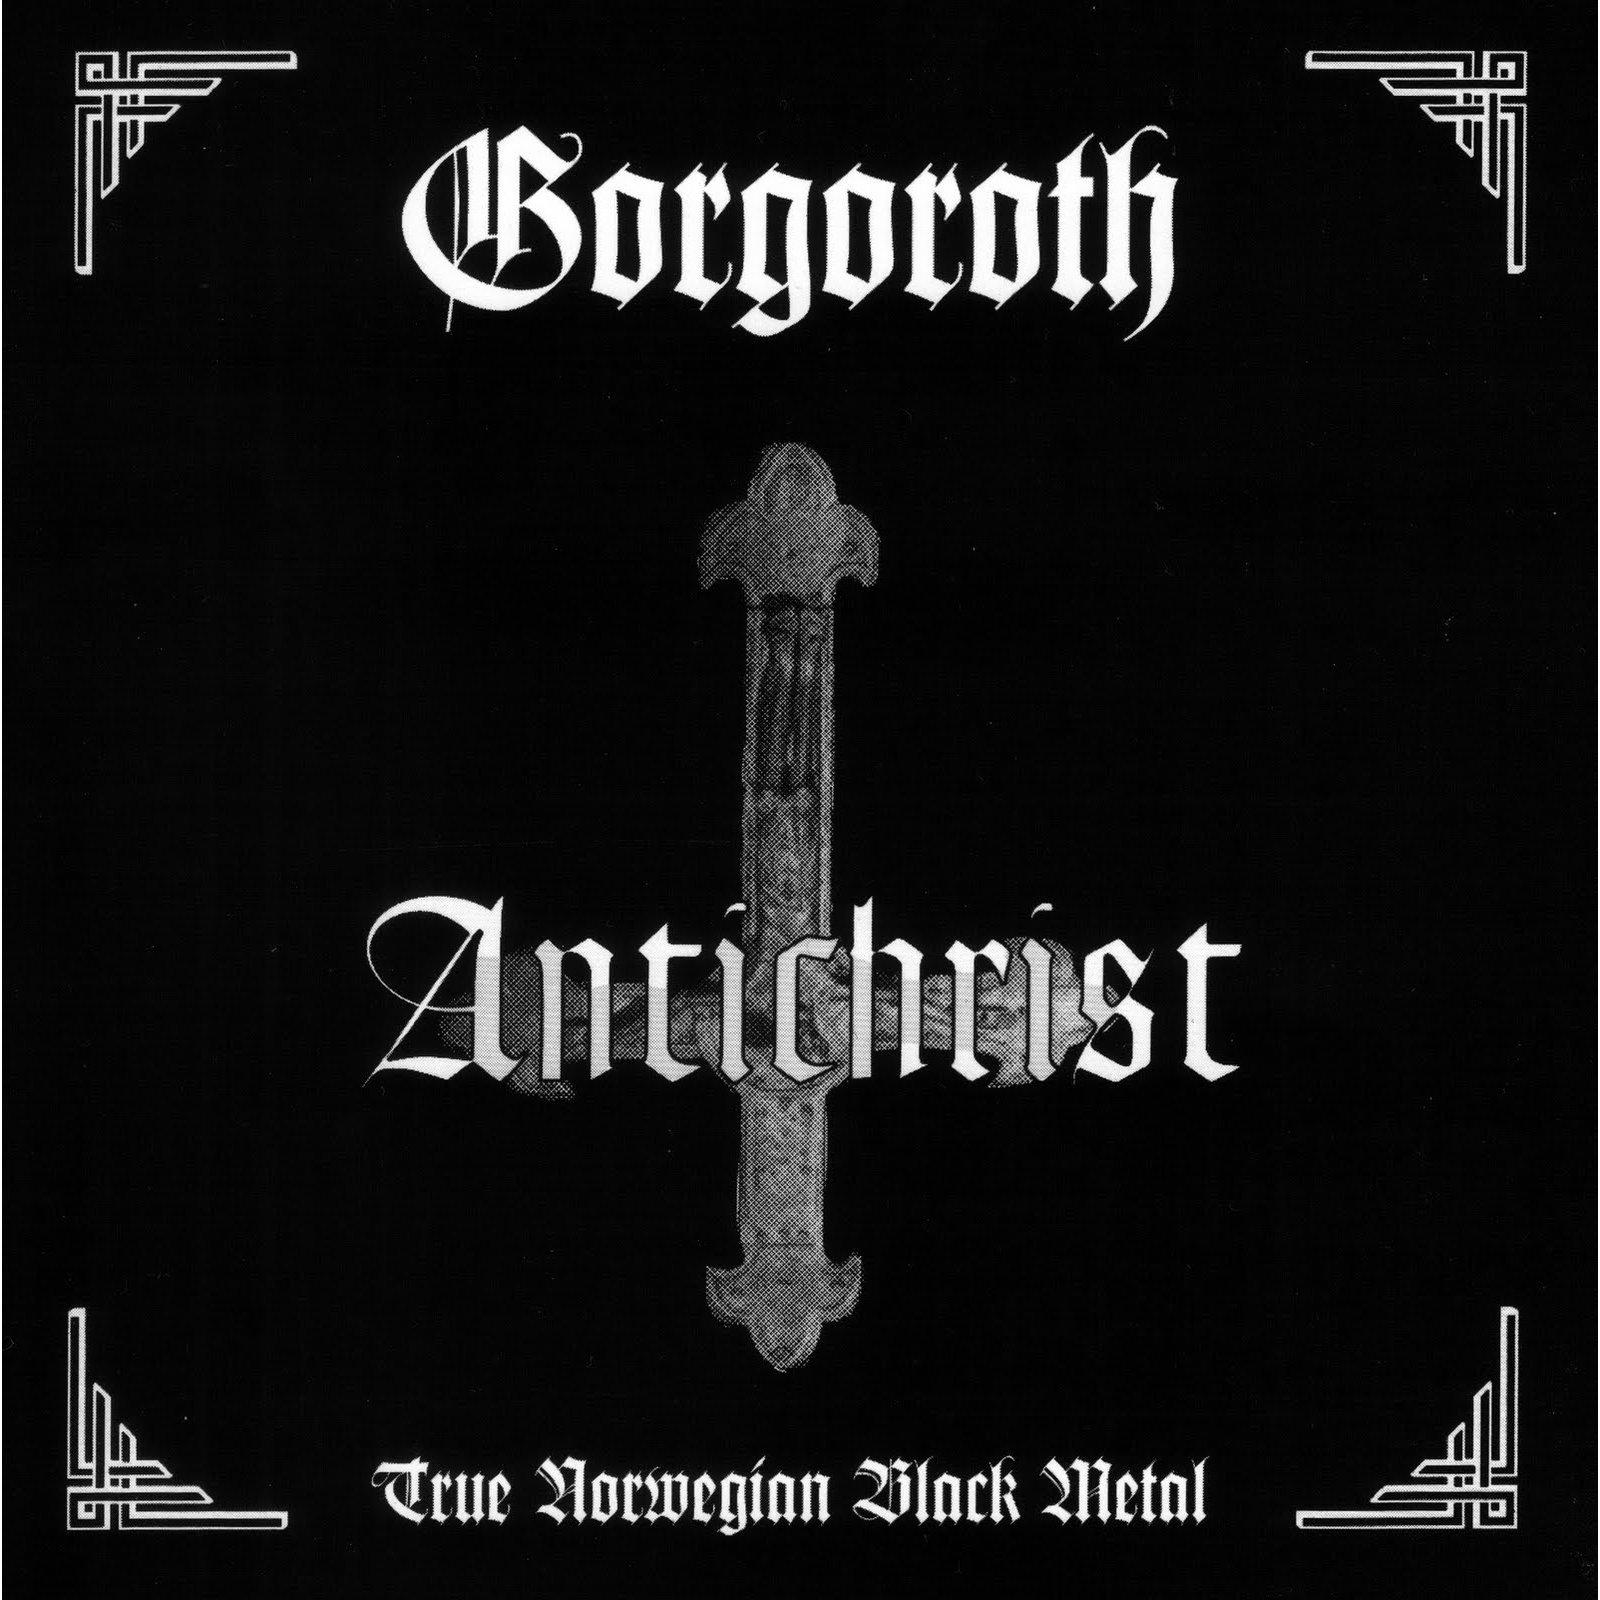 Vinilo : Gorgoroth - Antichrist (LP Vinyl)